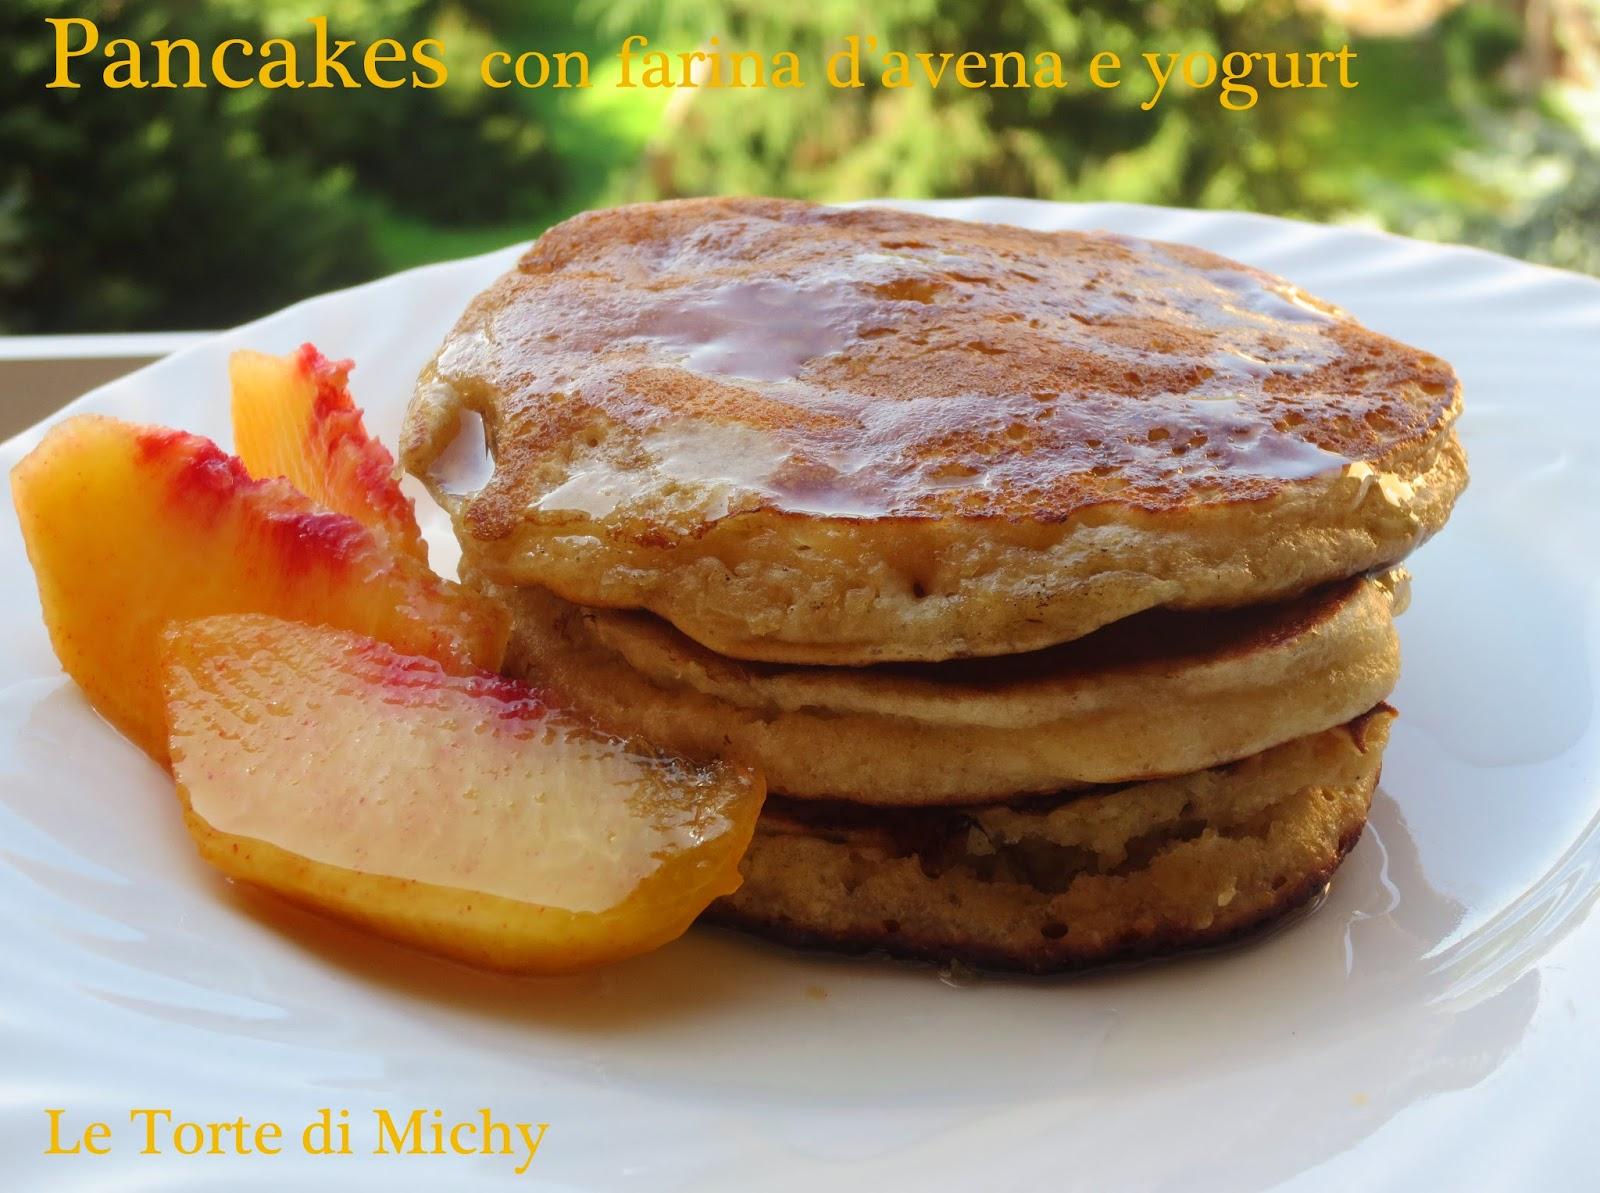 pancakes con farina d'avena e yogurt